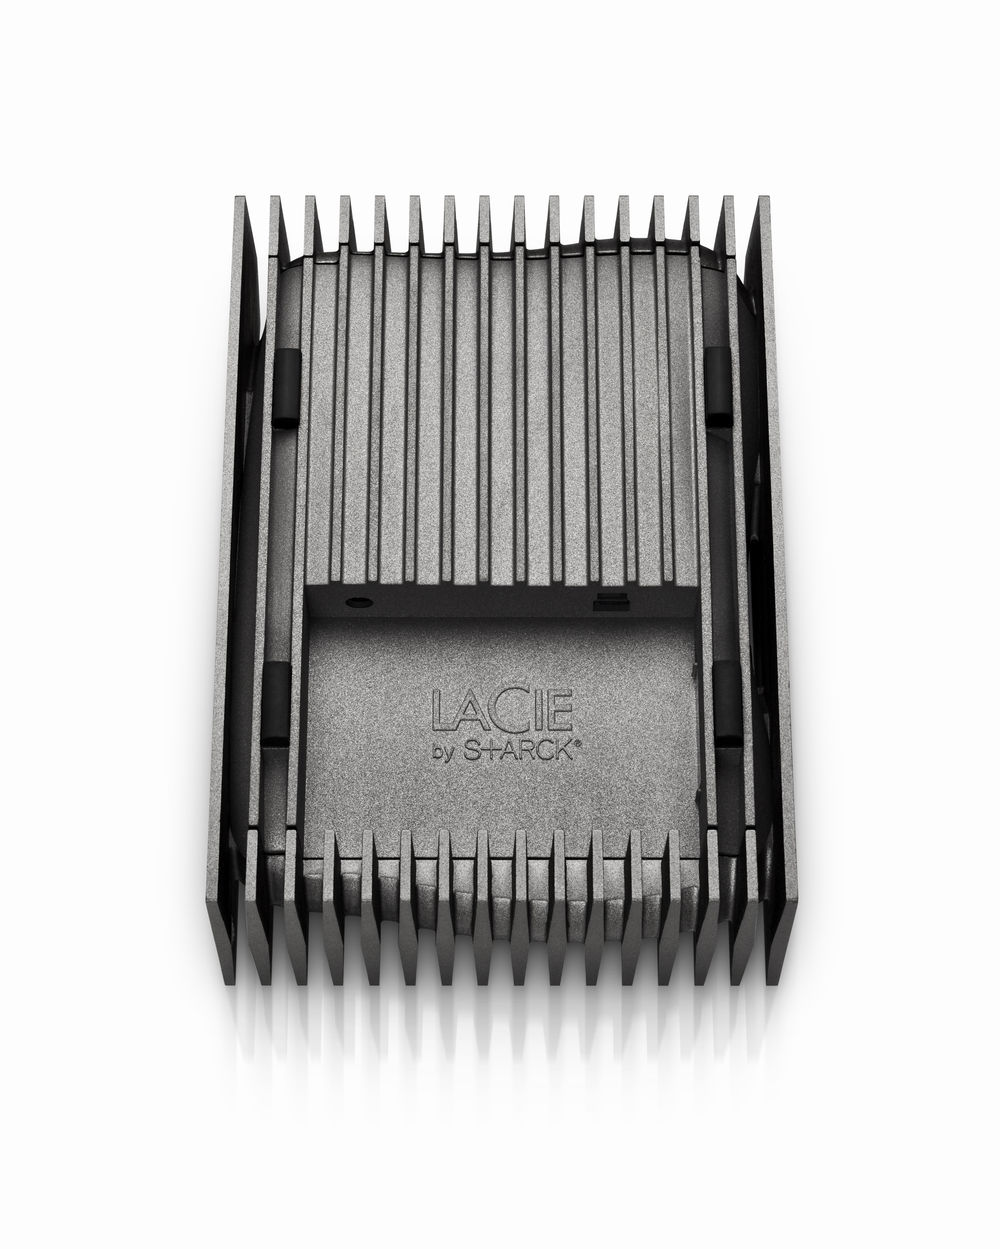 Metallic plates create a prism for a liquid-shaped hard drive - open spot has connectors